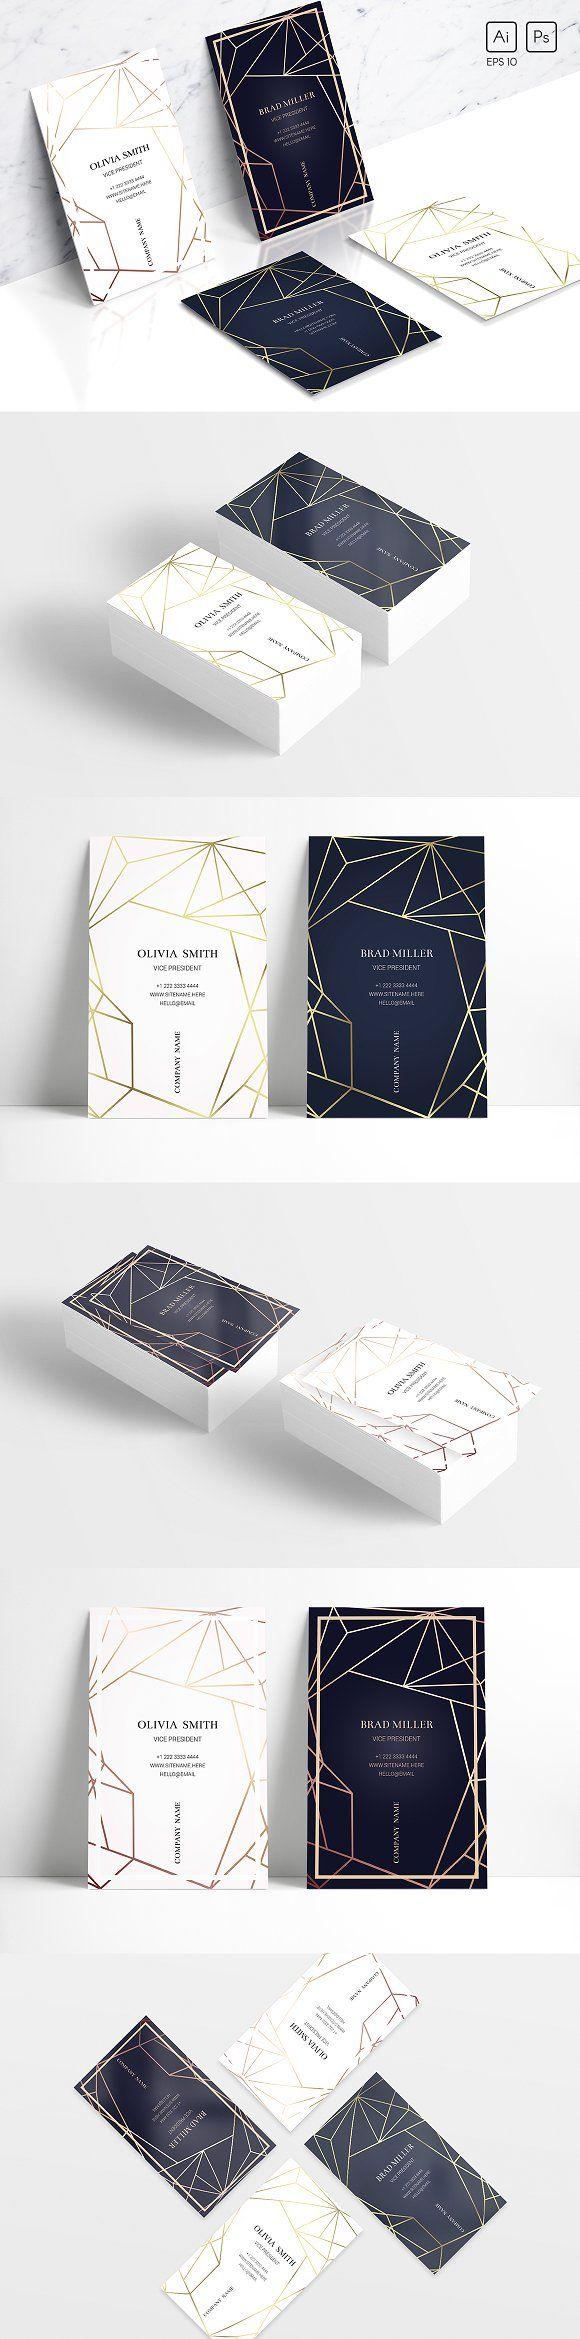 Geometric business card template by Radionova Anastasia on @creativemarket